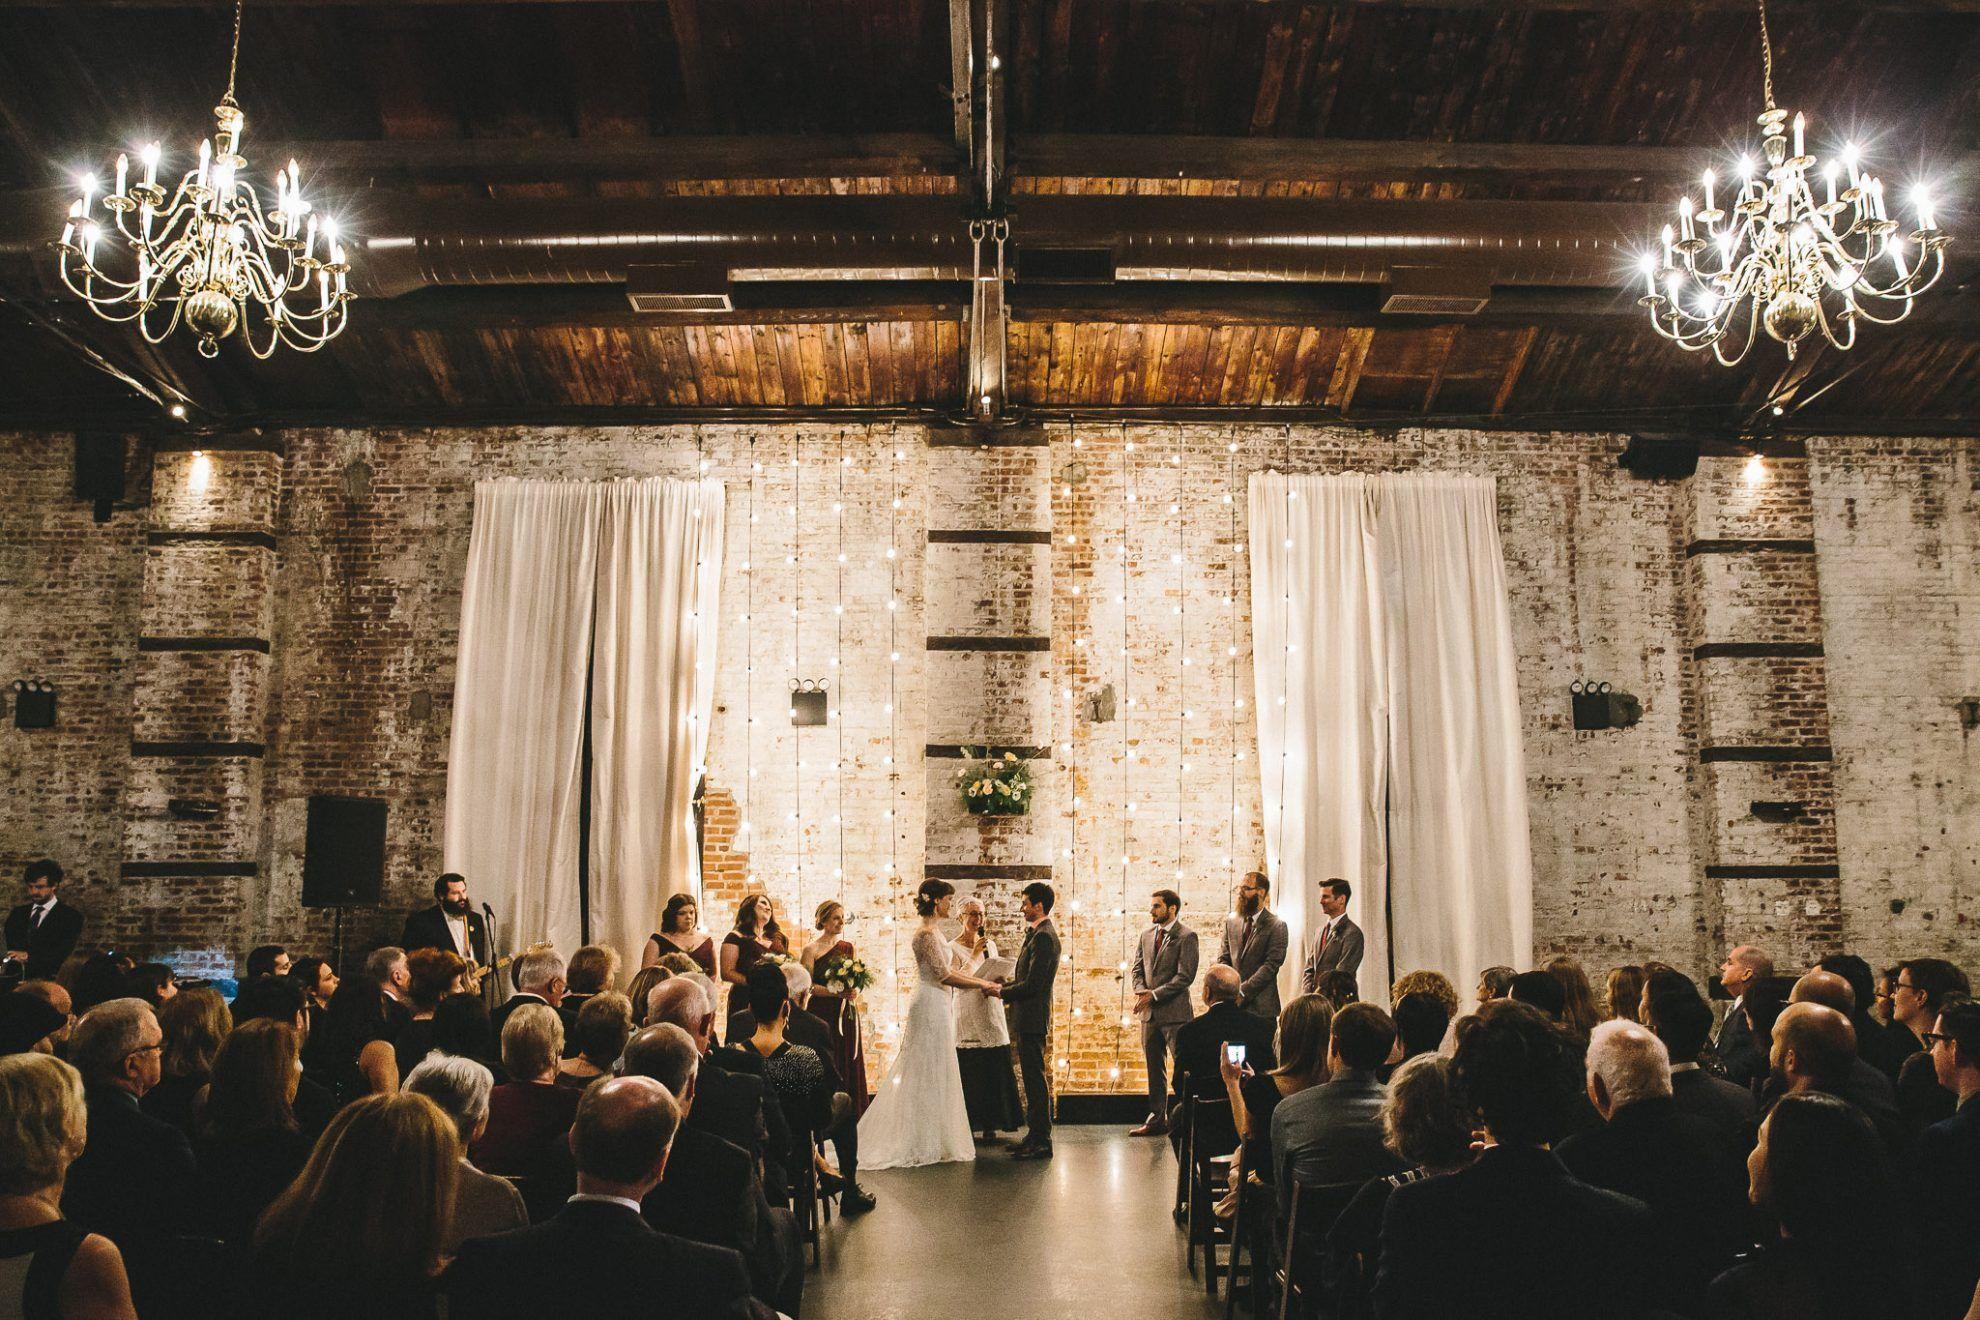 Alison Szleifer Of Naturally Delicious Elegant Green Building Wedding Photo By Edward Winter Readylu Nyc Wedding Photography Nyc Wedding Photos Nyc Wedding